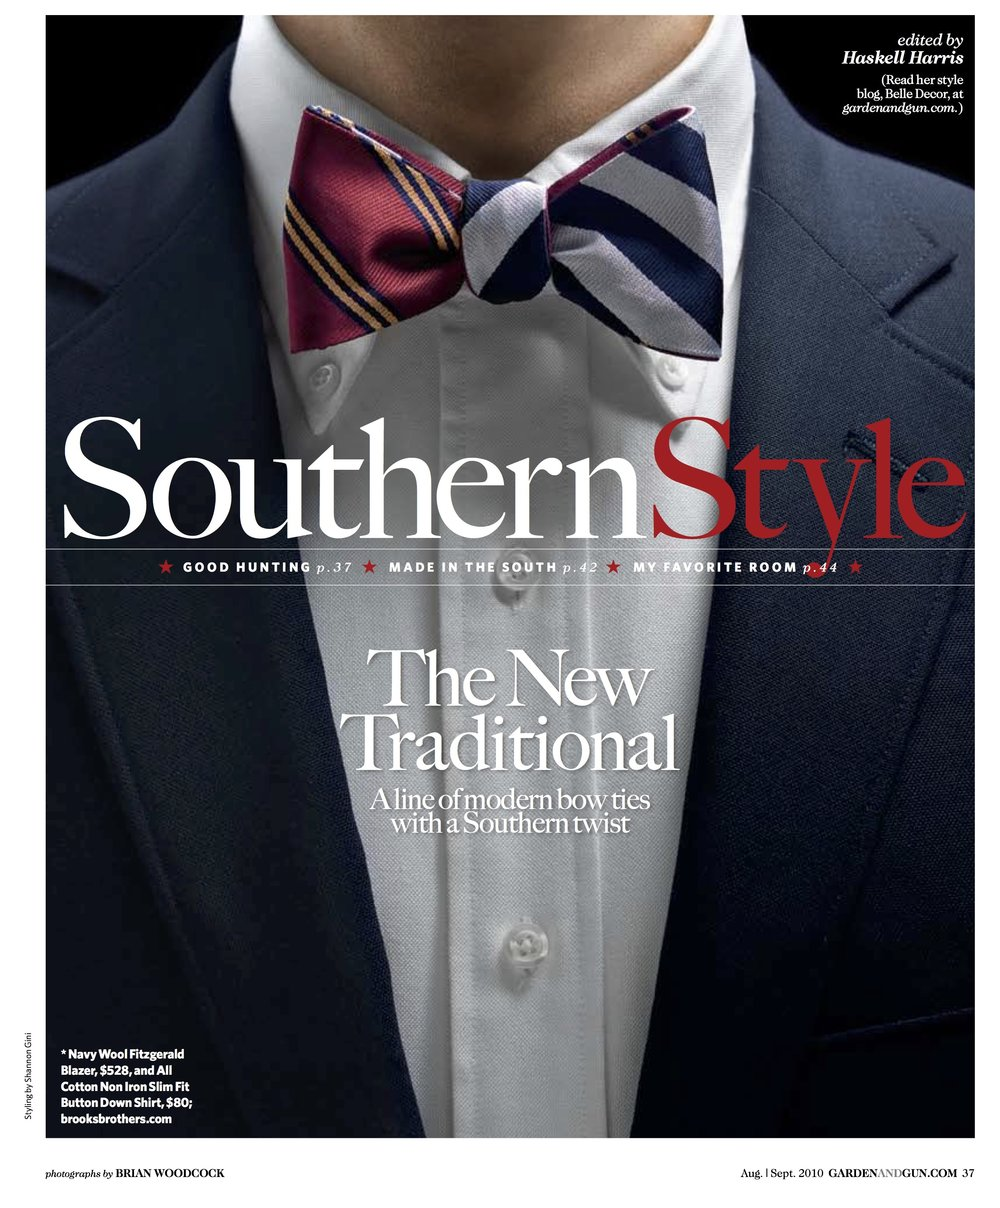 Garden & Gun Magazine - Southern Style: Fashion Styling